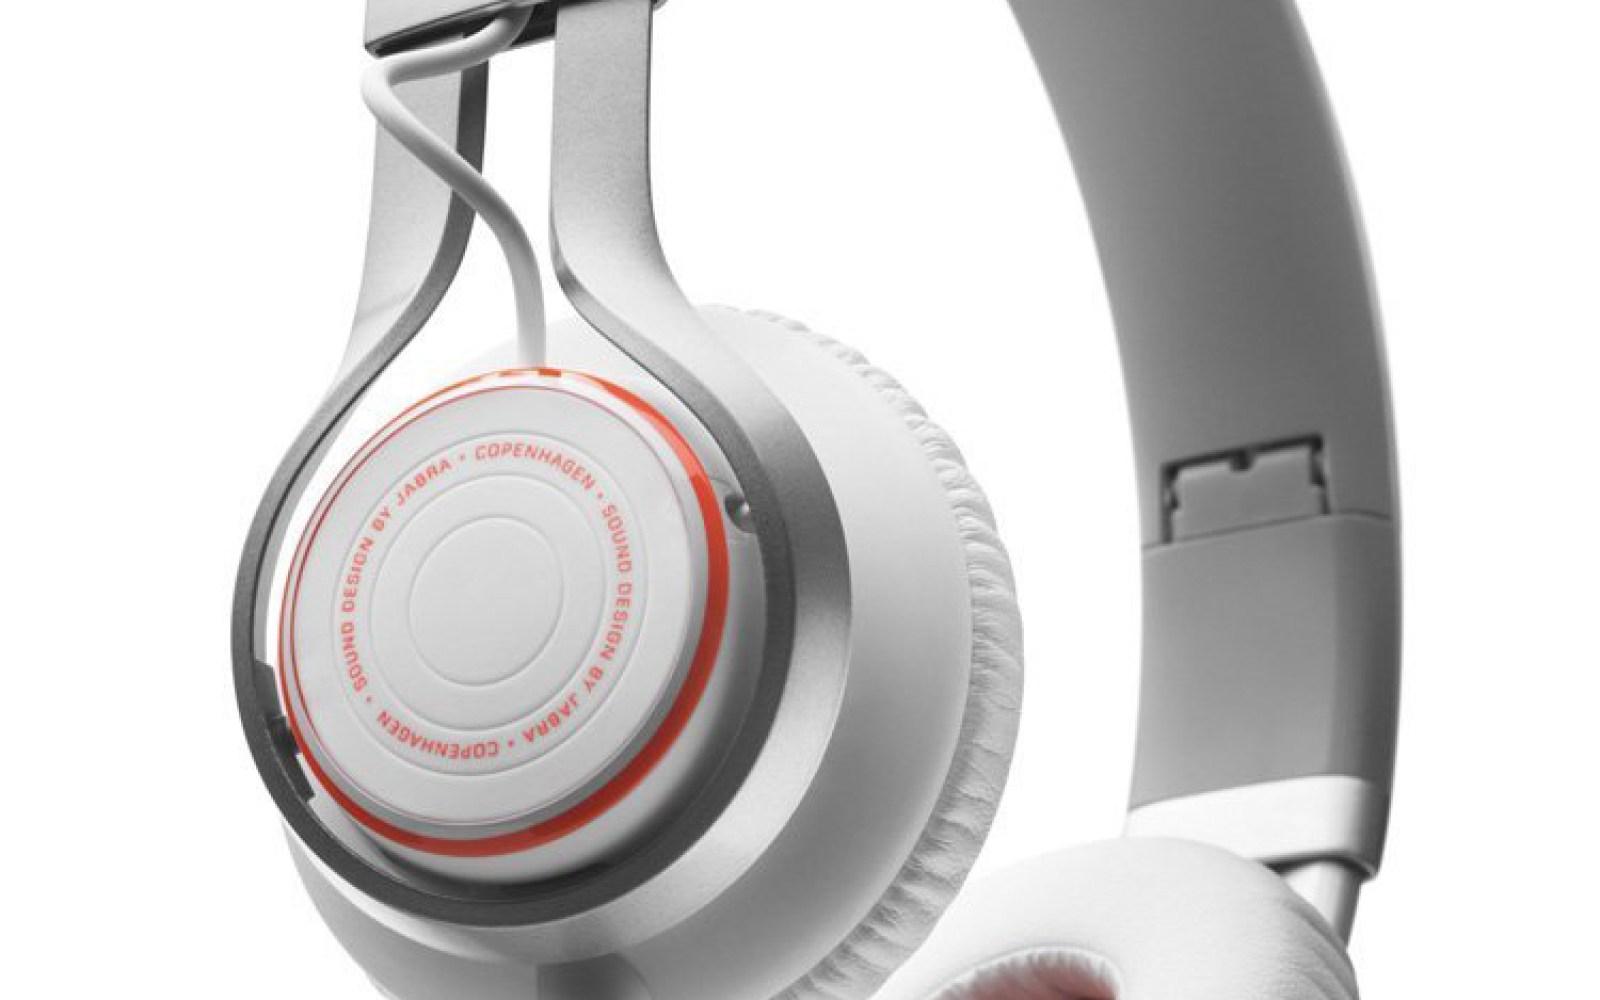 Headphones: Jabra Revo $50, MEElectronics Bluetooth Air-Fi Venture AF52 $48, Audio-Technica ATH-PRO 500 $79